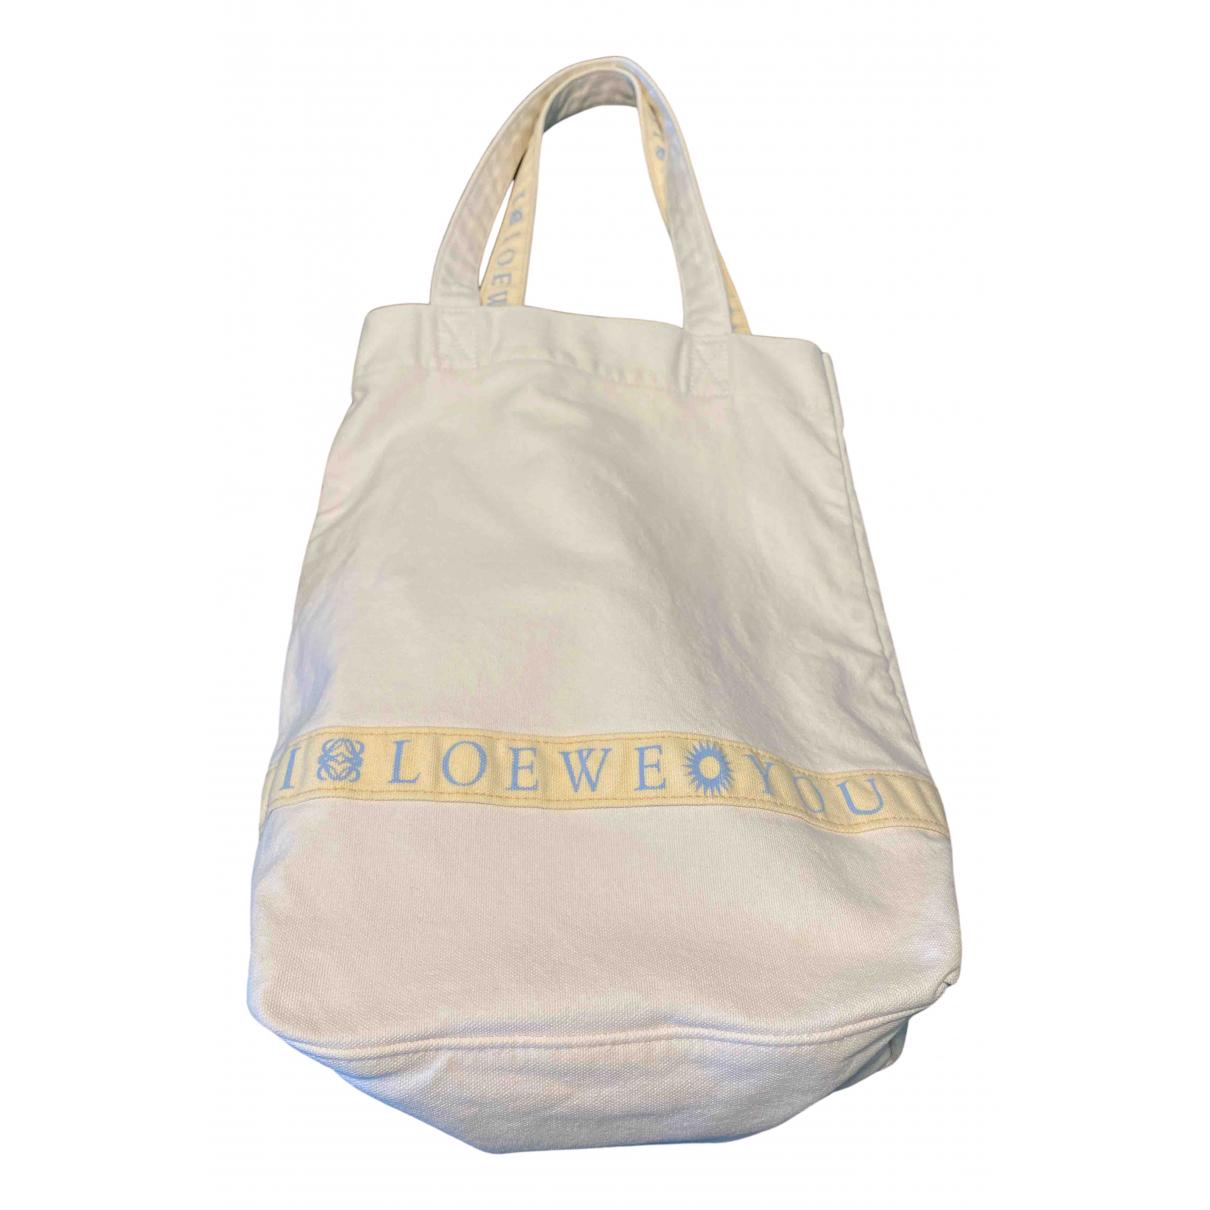 Loewe - Sac a main   pour femme en coton - blanc